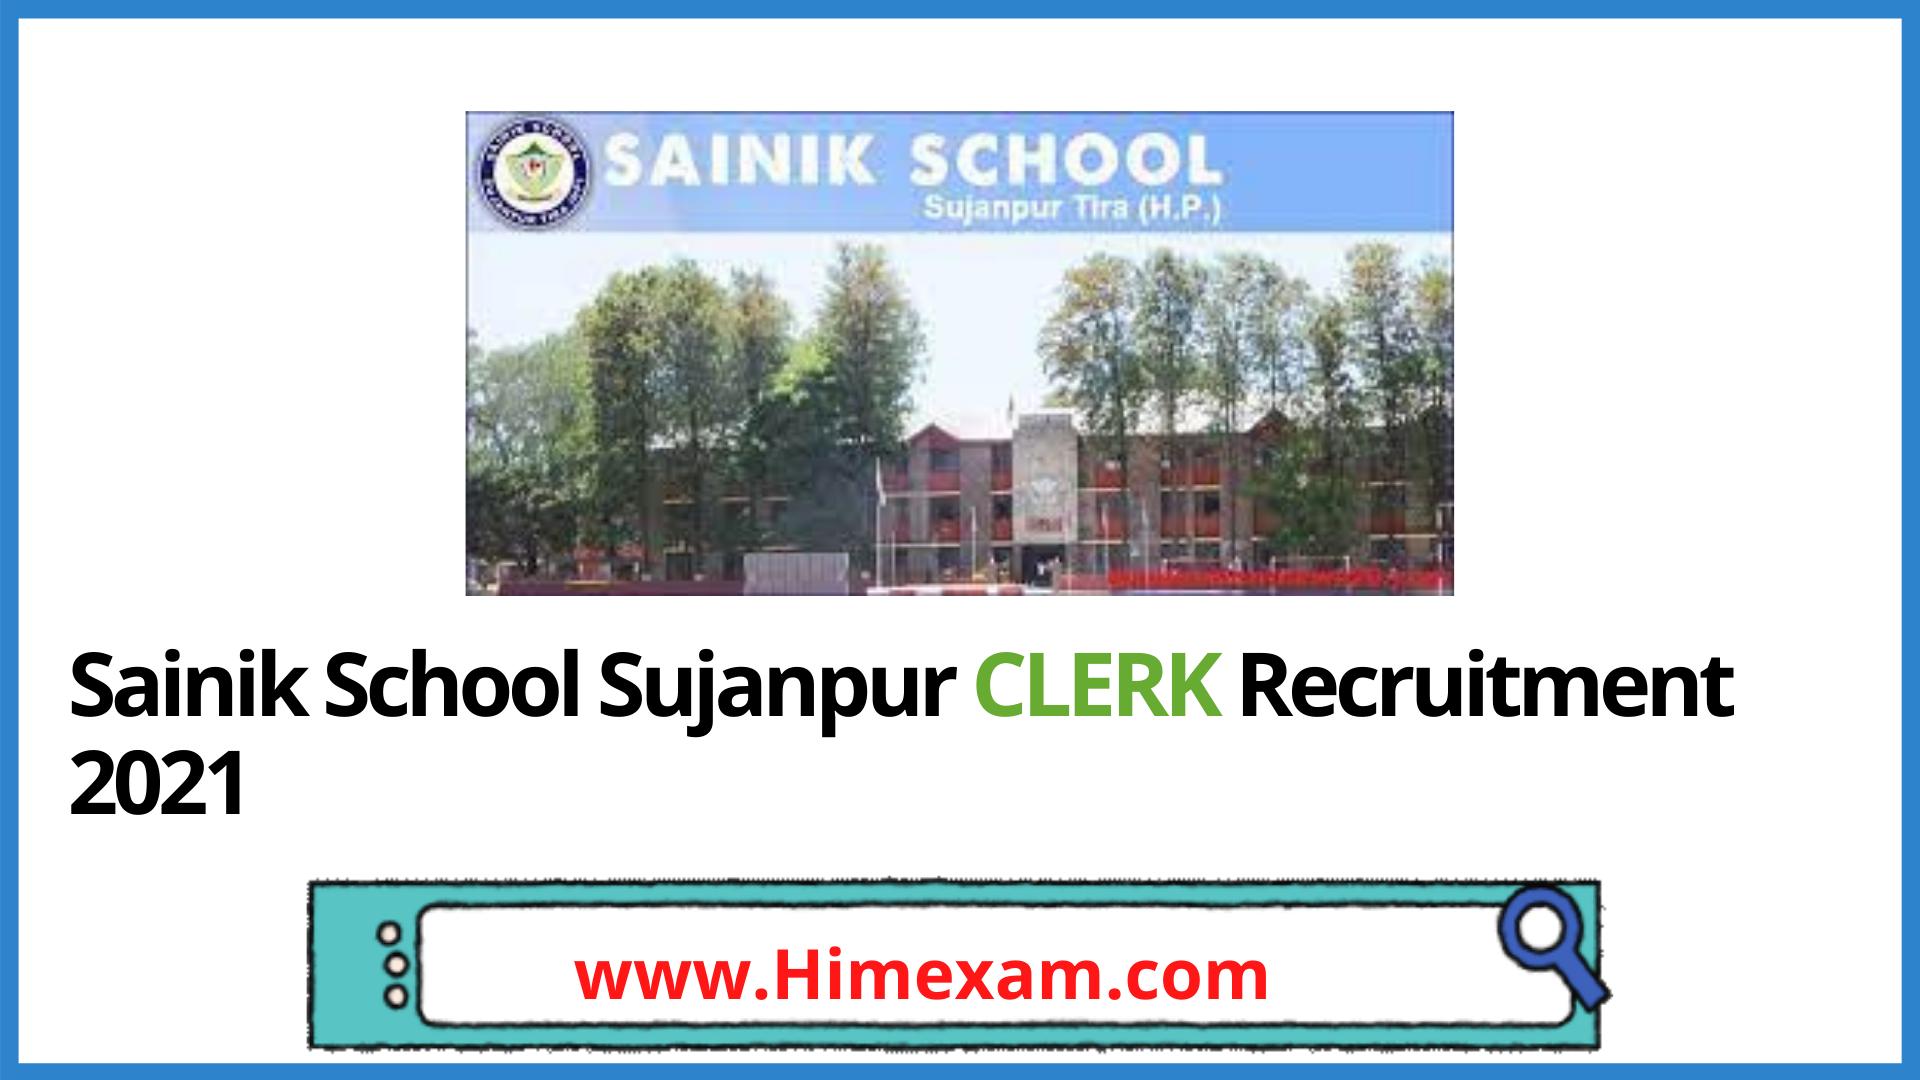 Sainik School Sujanpur Recruitment 2021